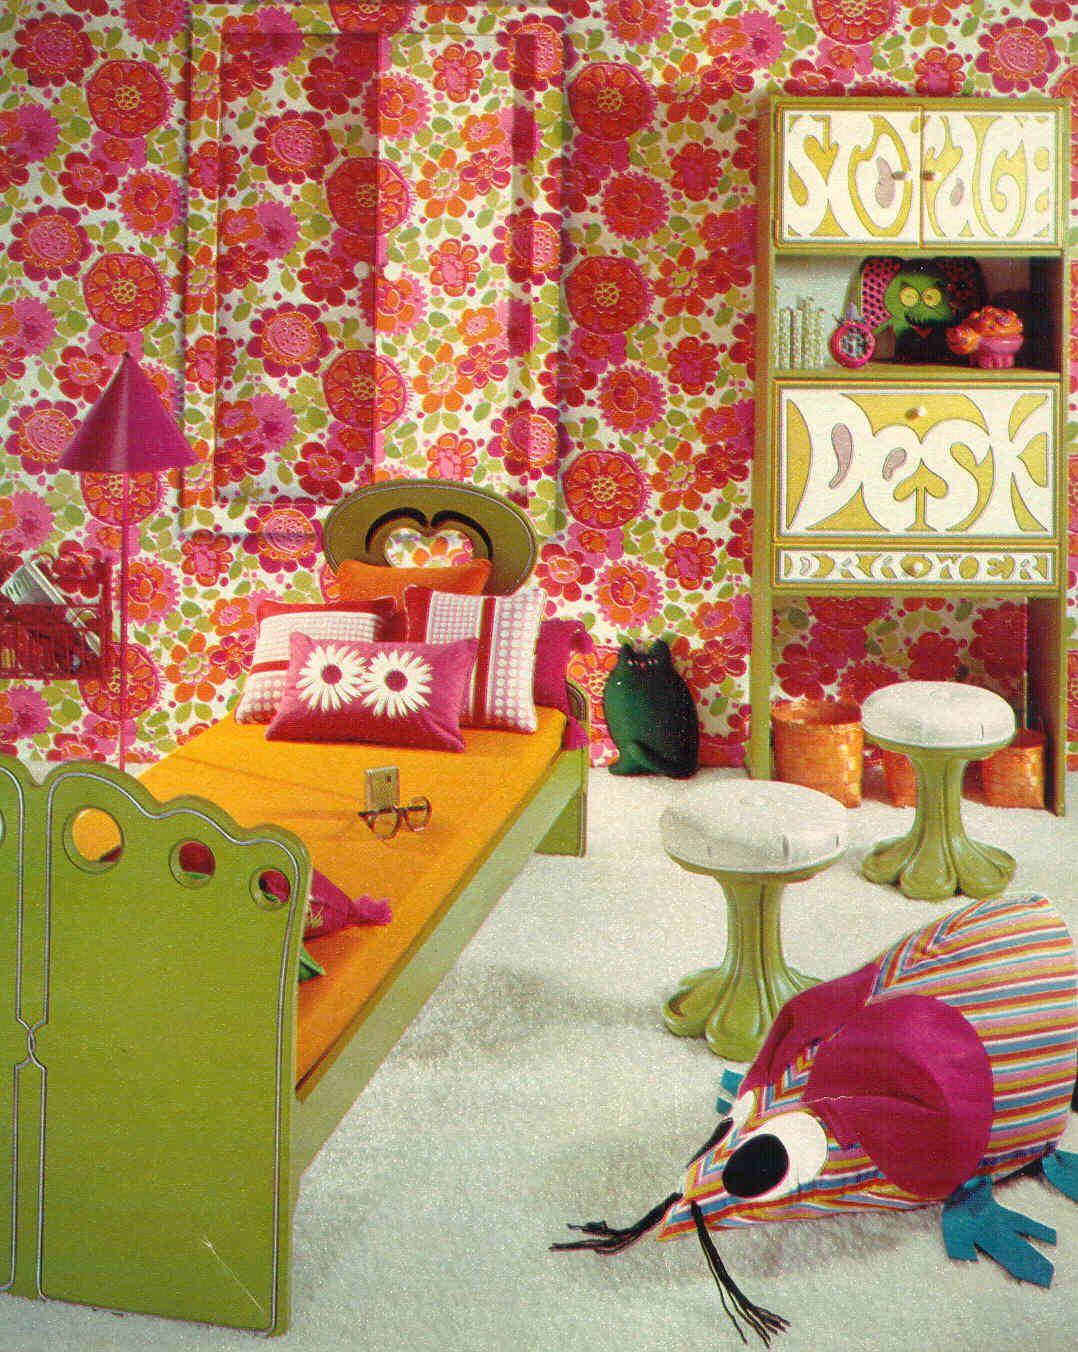 The Drexel 'Plus One' bedroom from Seventeen Magazine 1970 Google Image Result for http://3.bp.blogspot.com/_h5DTV--cNLI/TG2IFEUvDoI/AAAAAAAAJrU/4QAUW_5Qtlo/s1600/SeventeenbdrmNo3.jpg